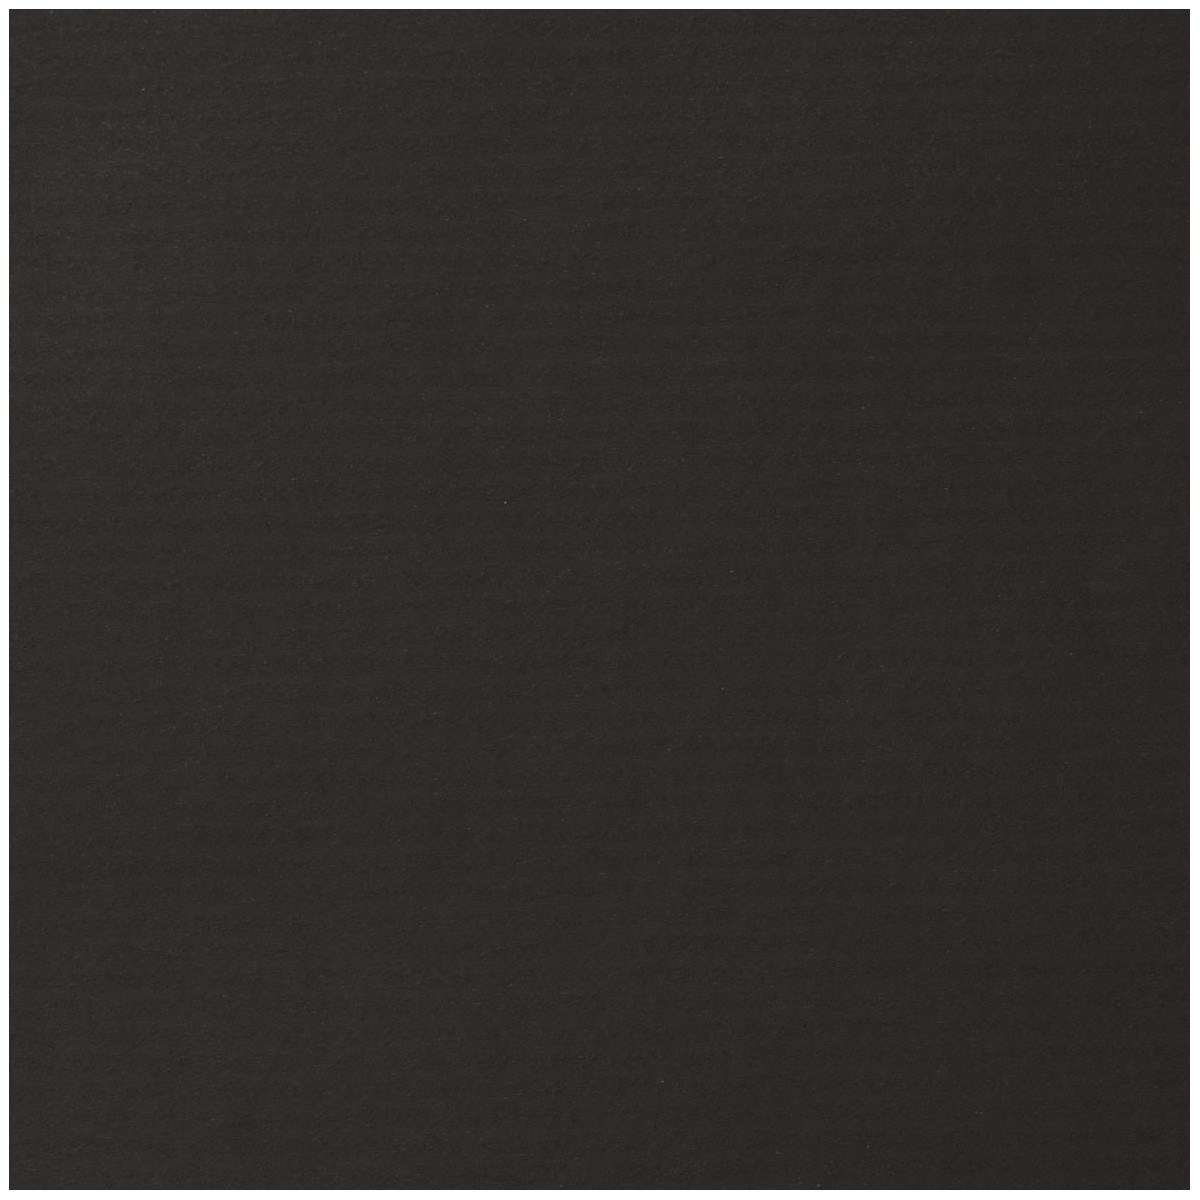 Carta Sealing Bianco ECOWHITE Gr.60 Fogli Cm.70x100 Colori Tinta Unita (al Kg.) Nero